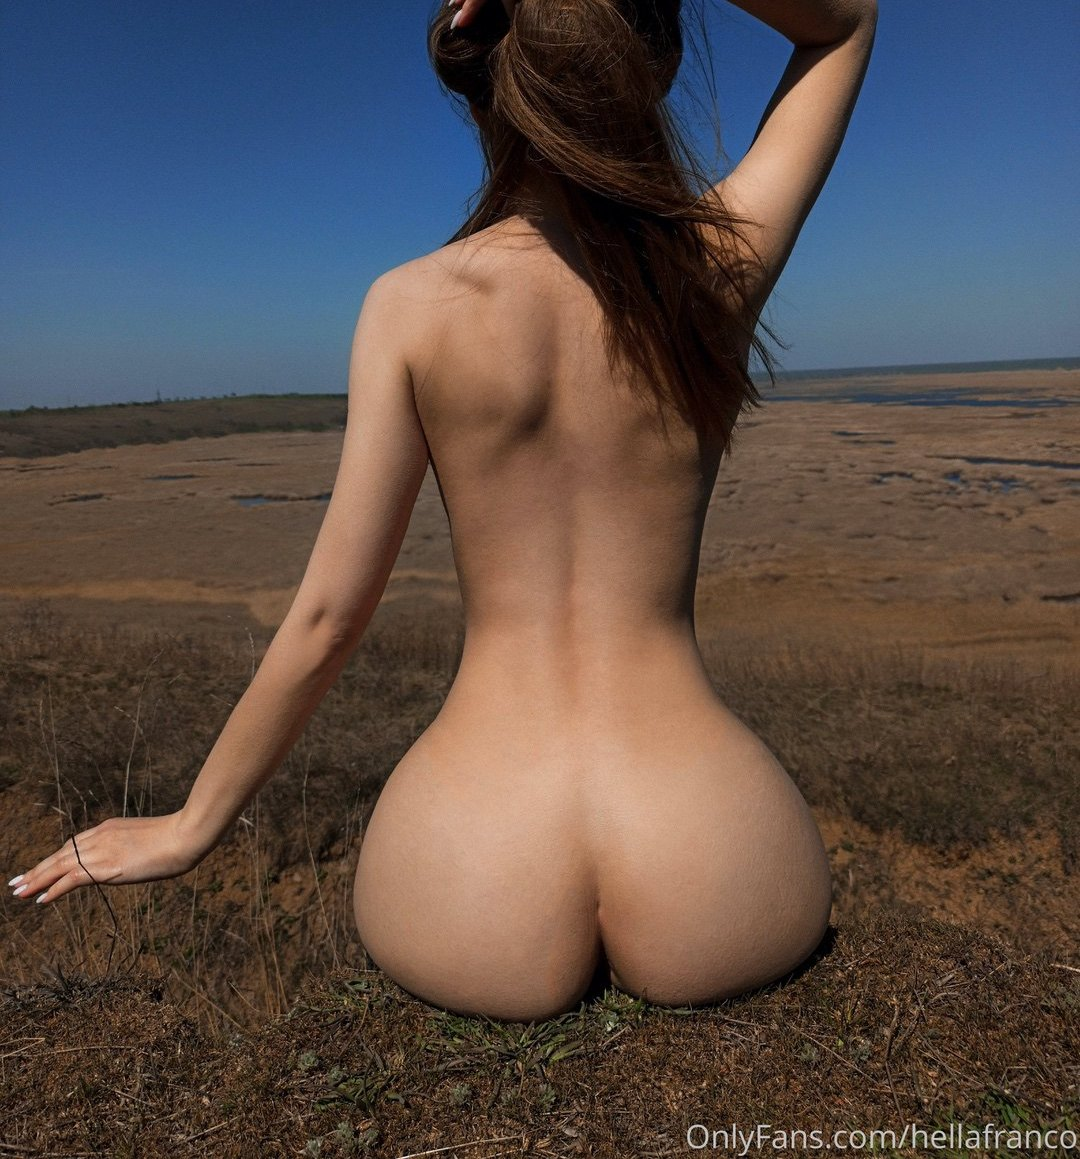 Hellafranco Onlyfans Nudes Leaks 0013